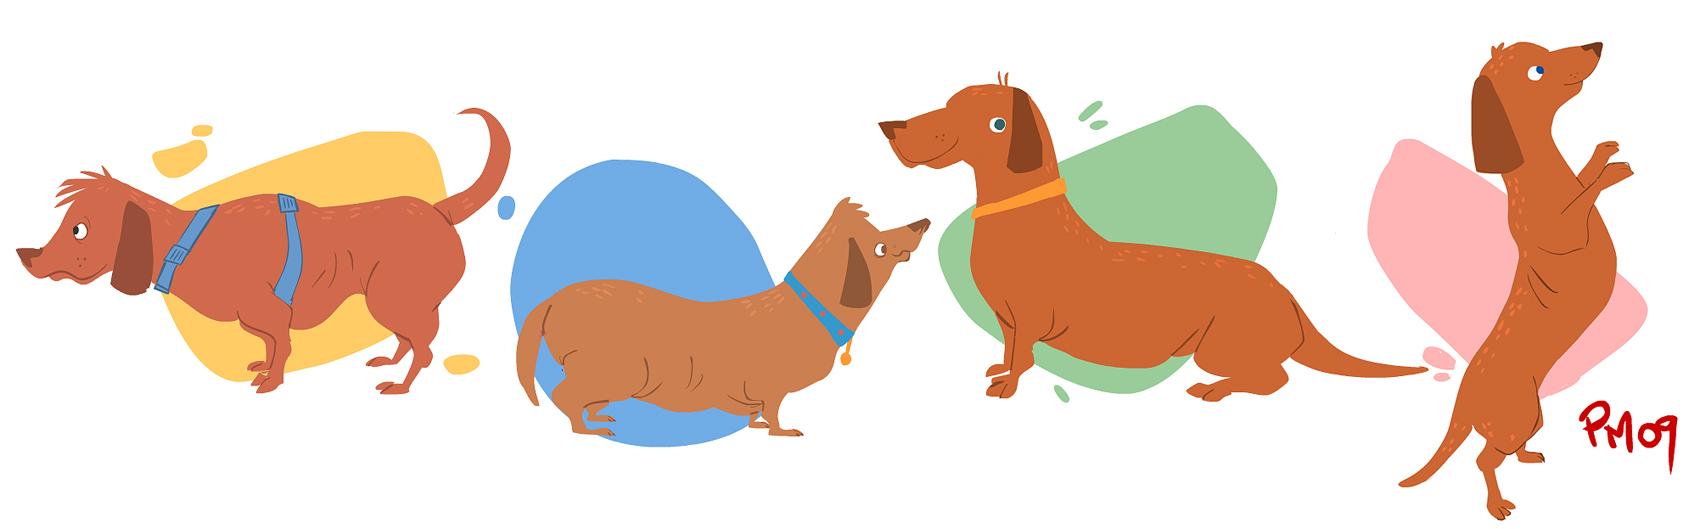 dogs by SomethingEveryDay